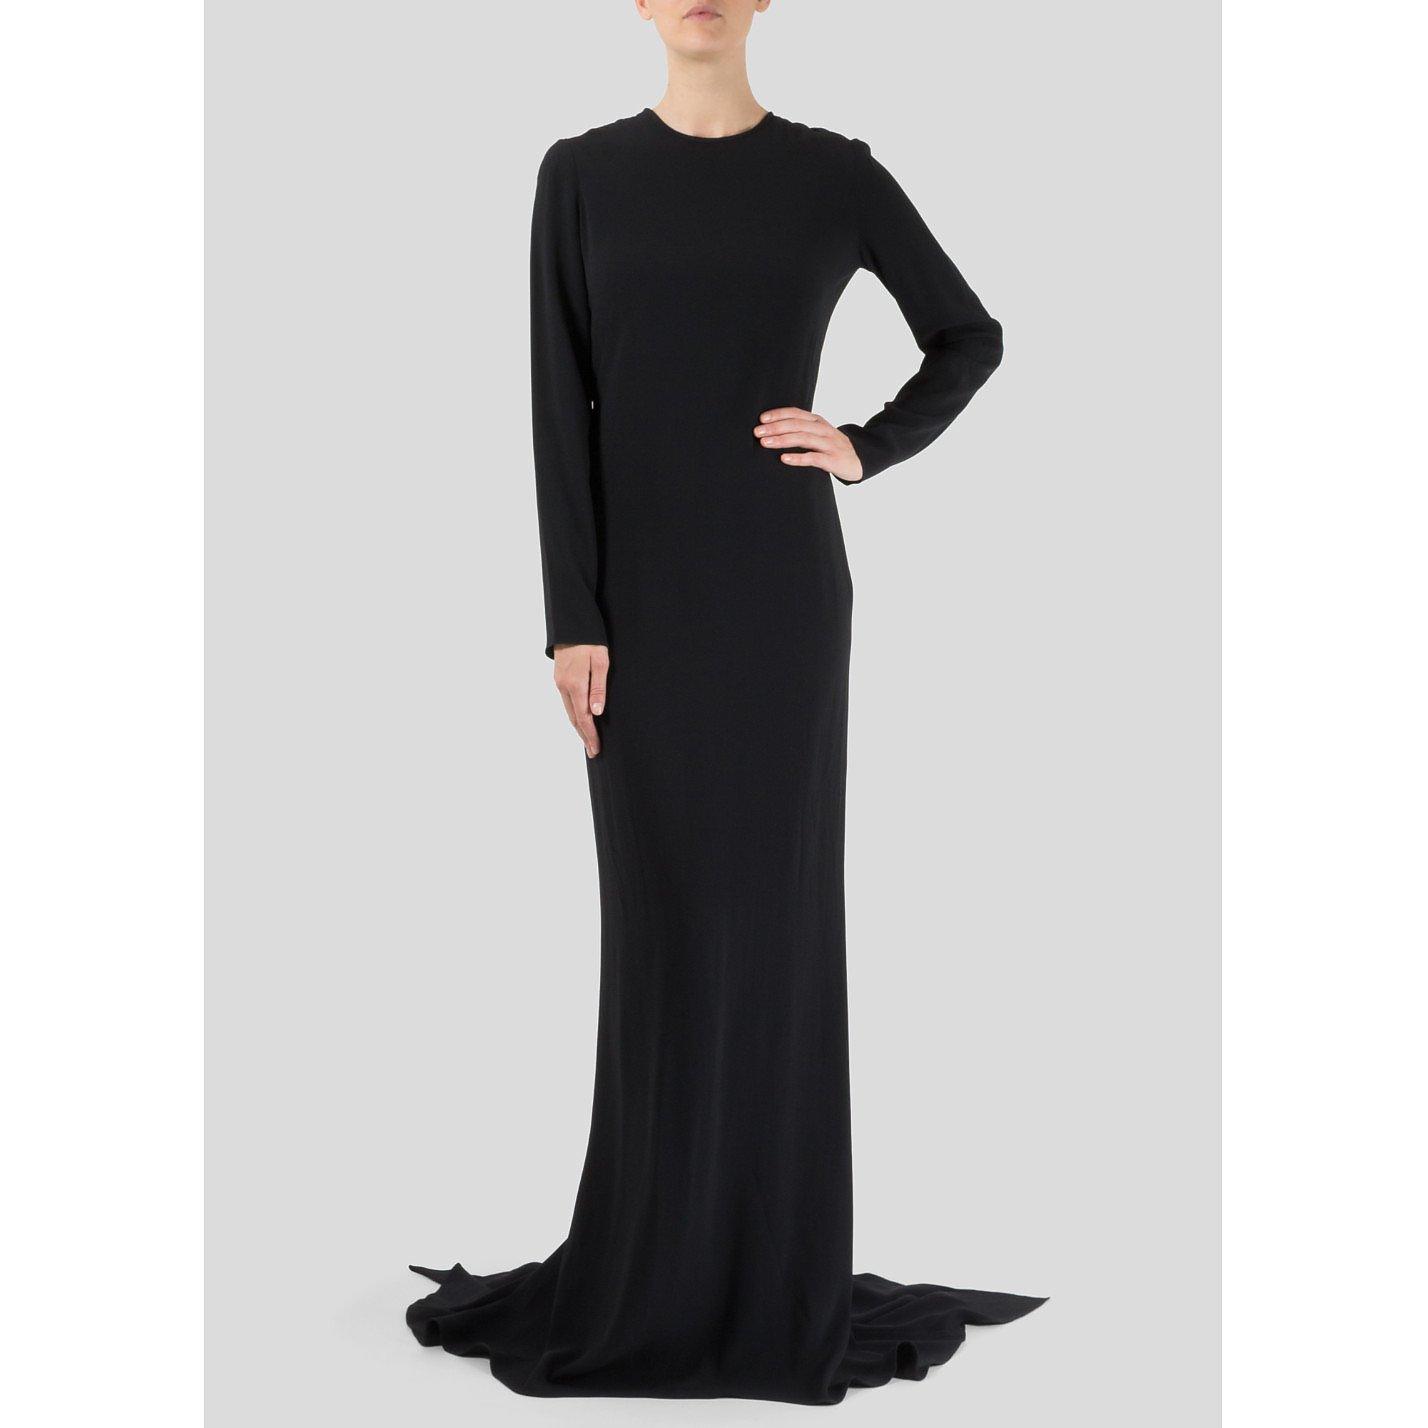 Maria Grachvogel Lichina Dress